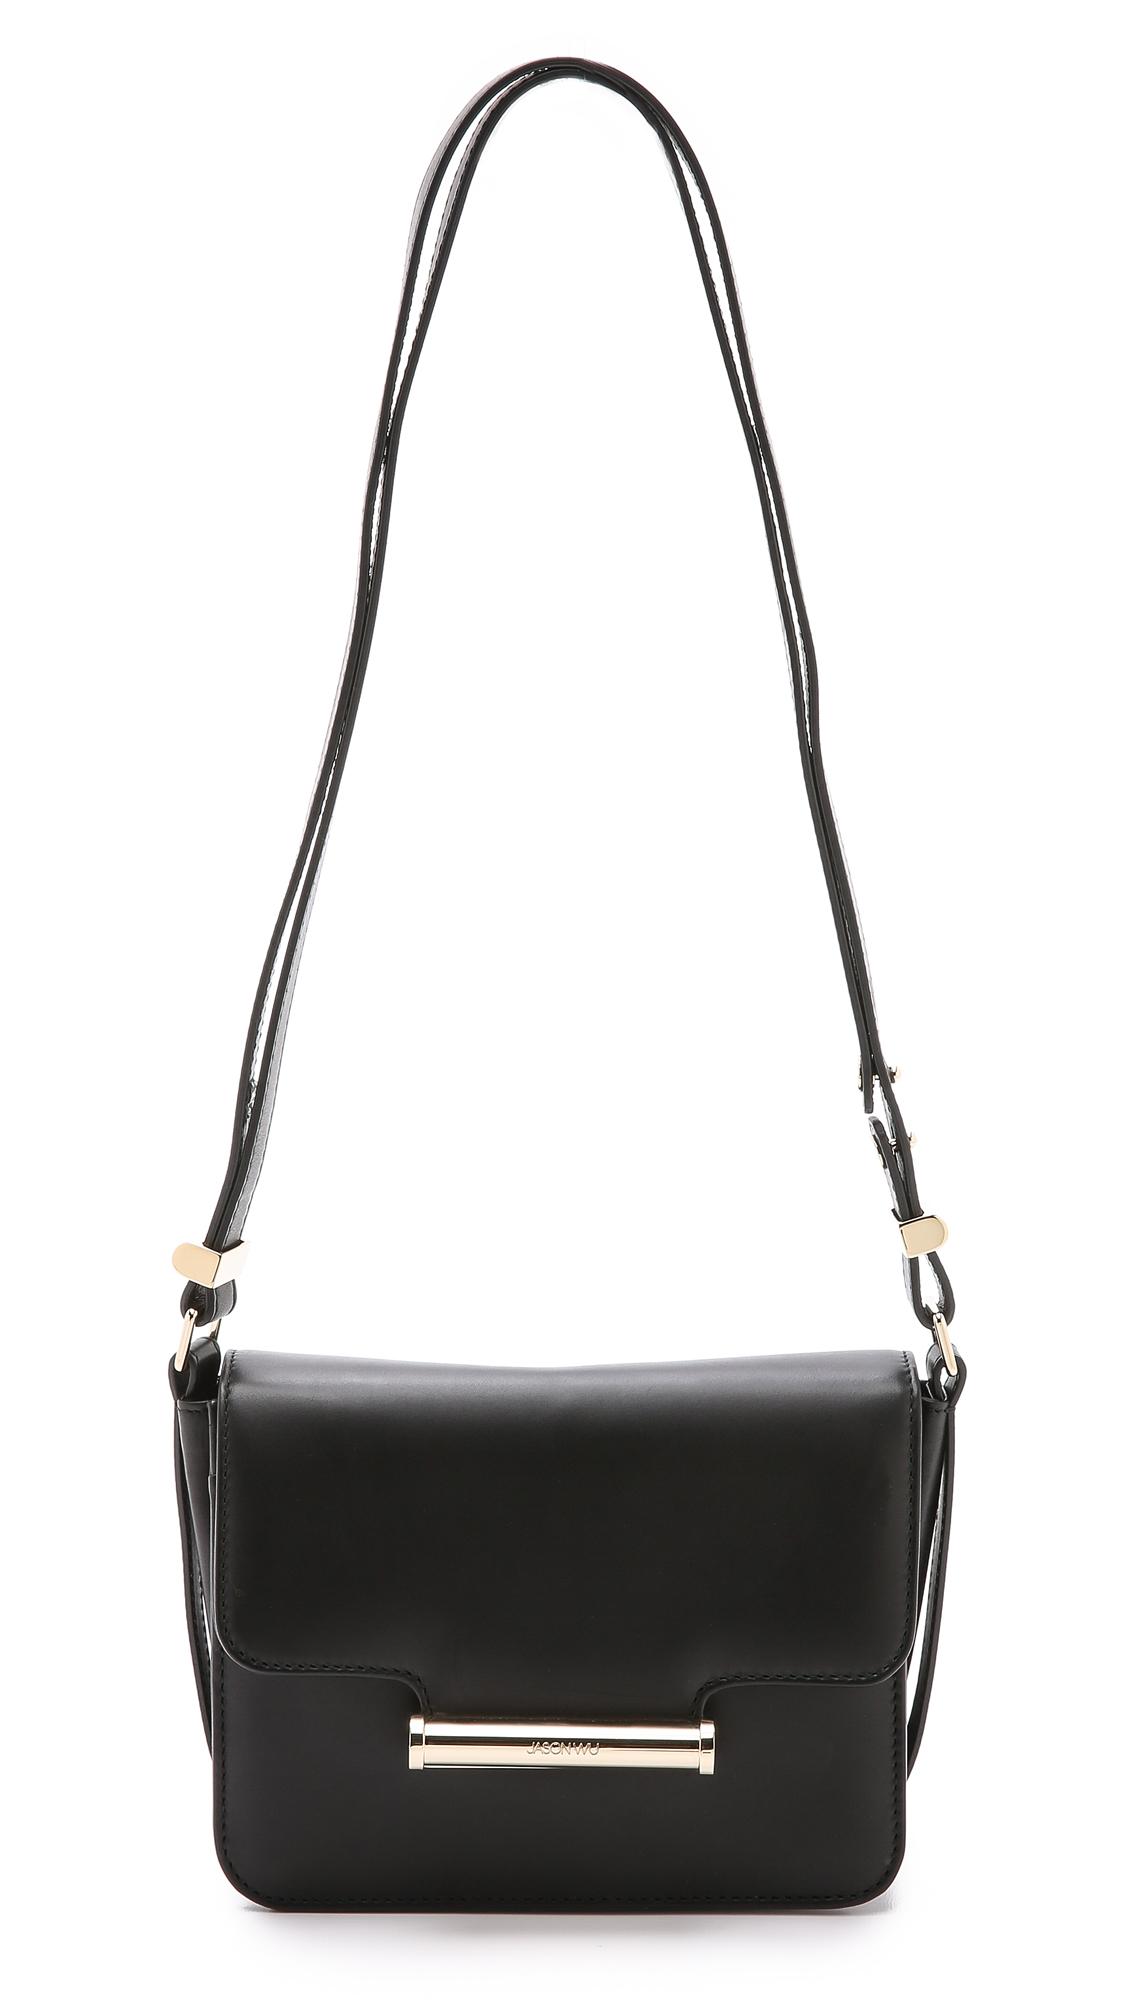 Jason Wu Diane Mini Calf-Hair Crossbody Saddle Bag, Emerald In Black